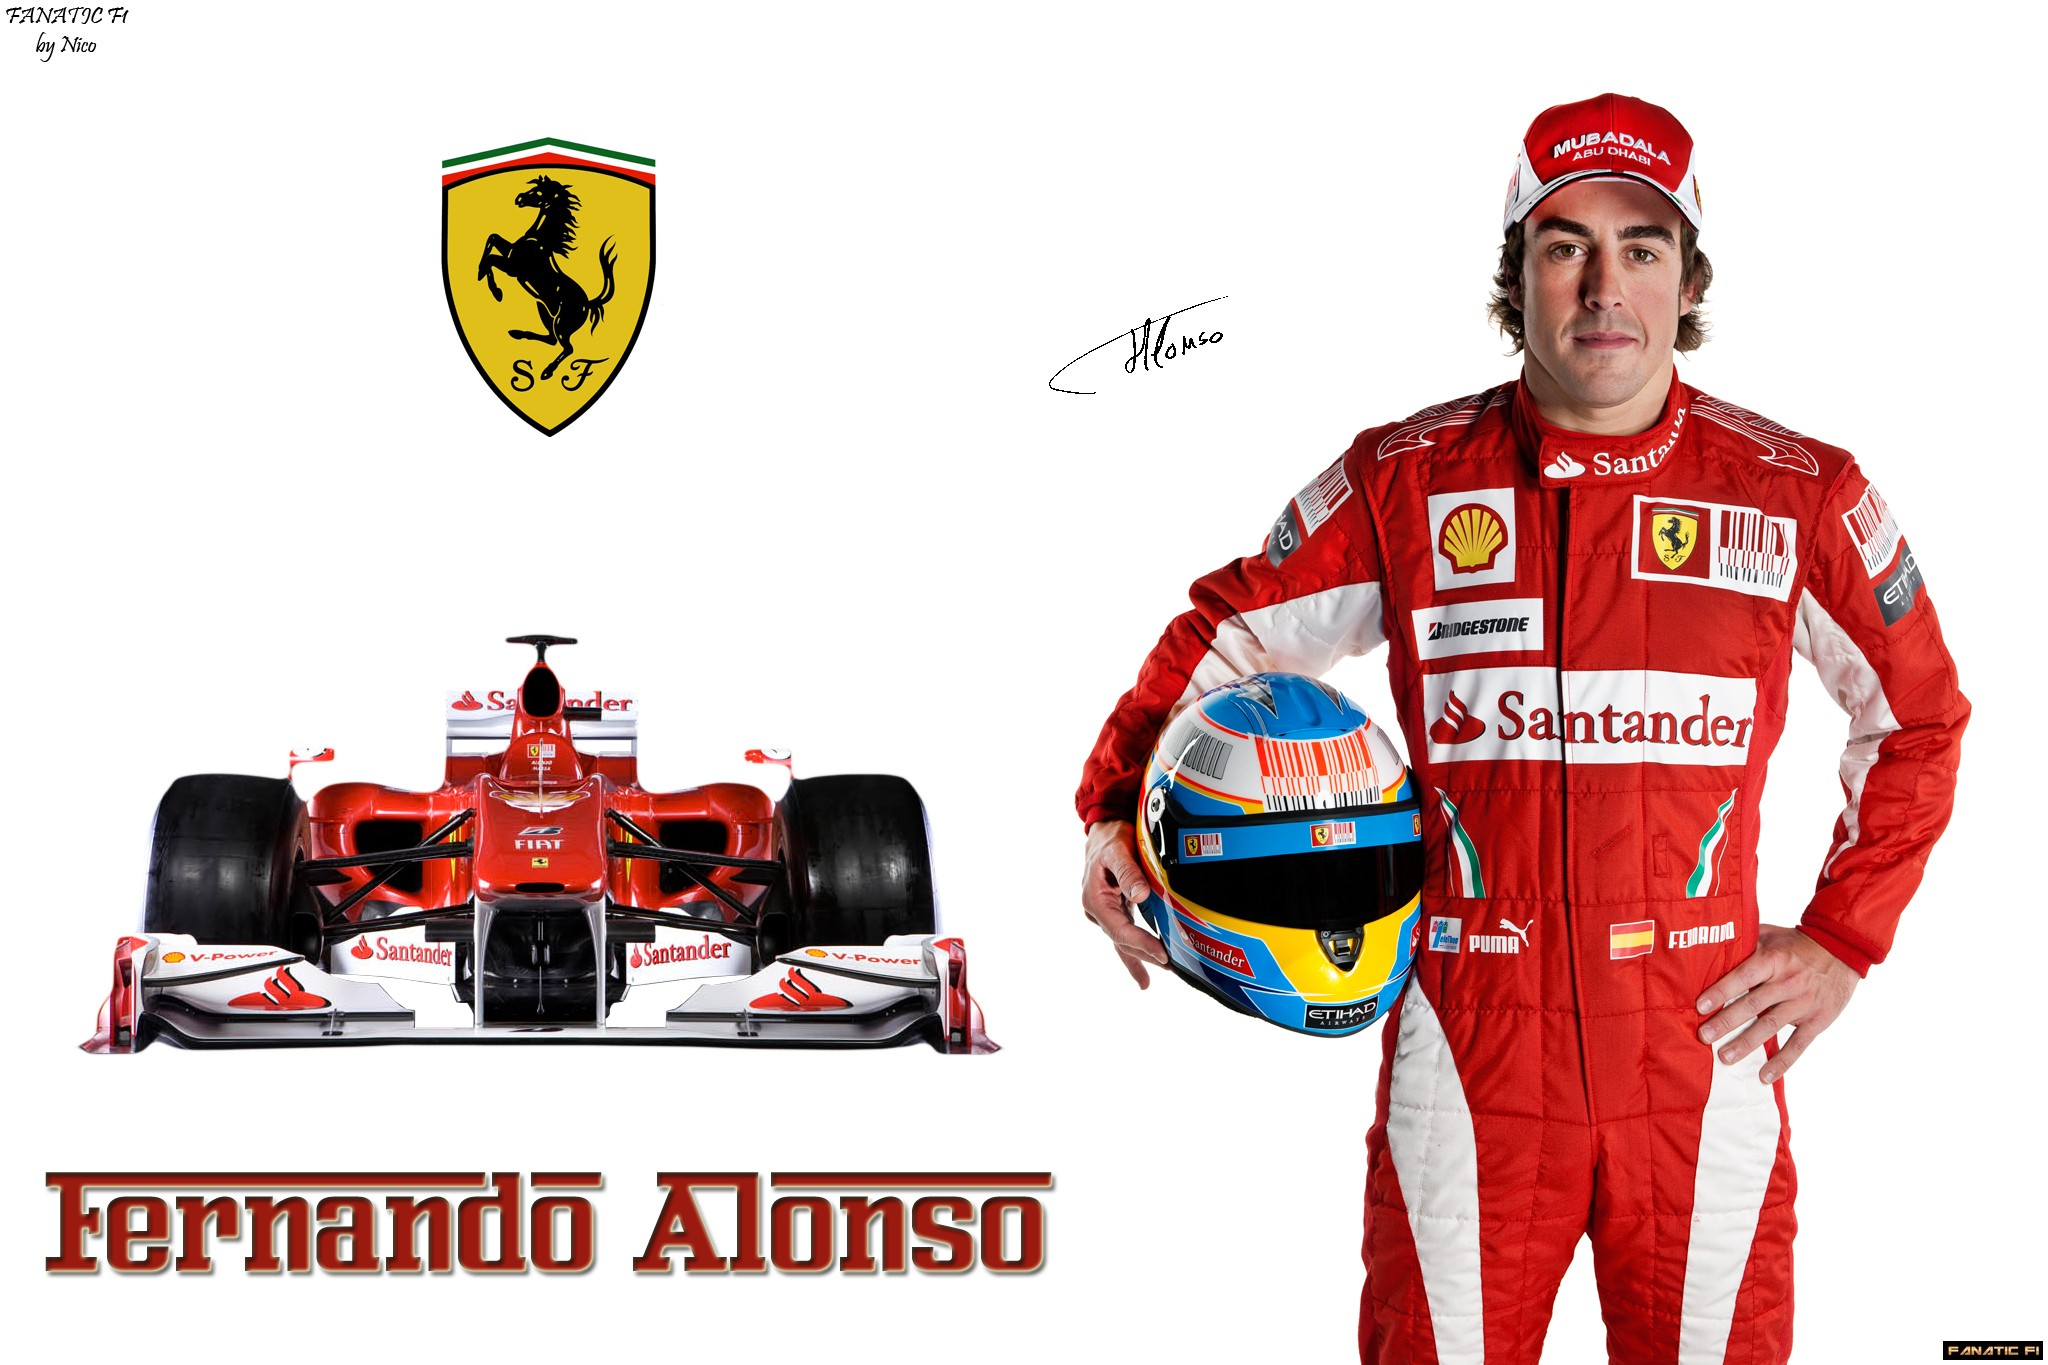 Fernando Alonso car wallpaper High Quality WallpapersWallpaper 2048x1365